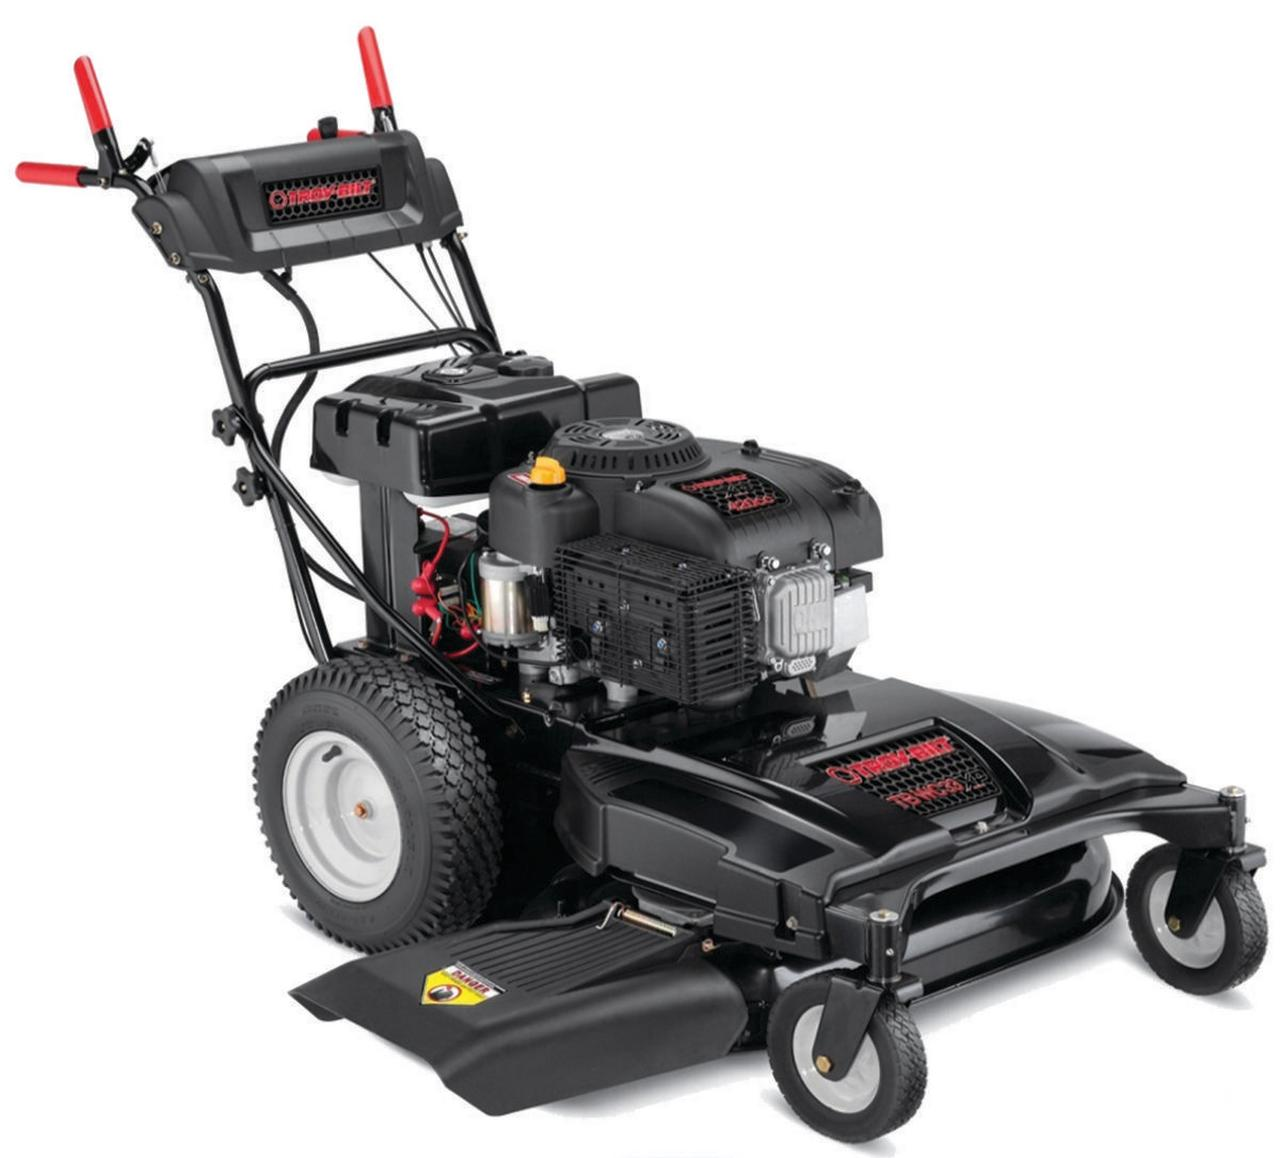 Troy-Bilt 12AE76JU011 Lawn Mower, 33 in W x 1-1 4 to 3-3 4 in H Cutting, 420 cc, 8 qt Gas by MTD Products